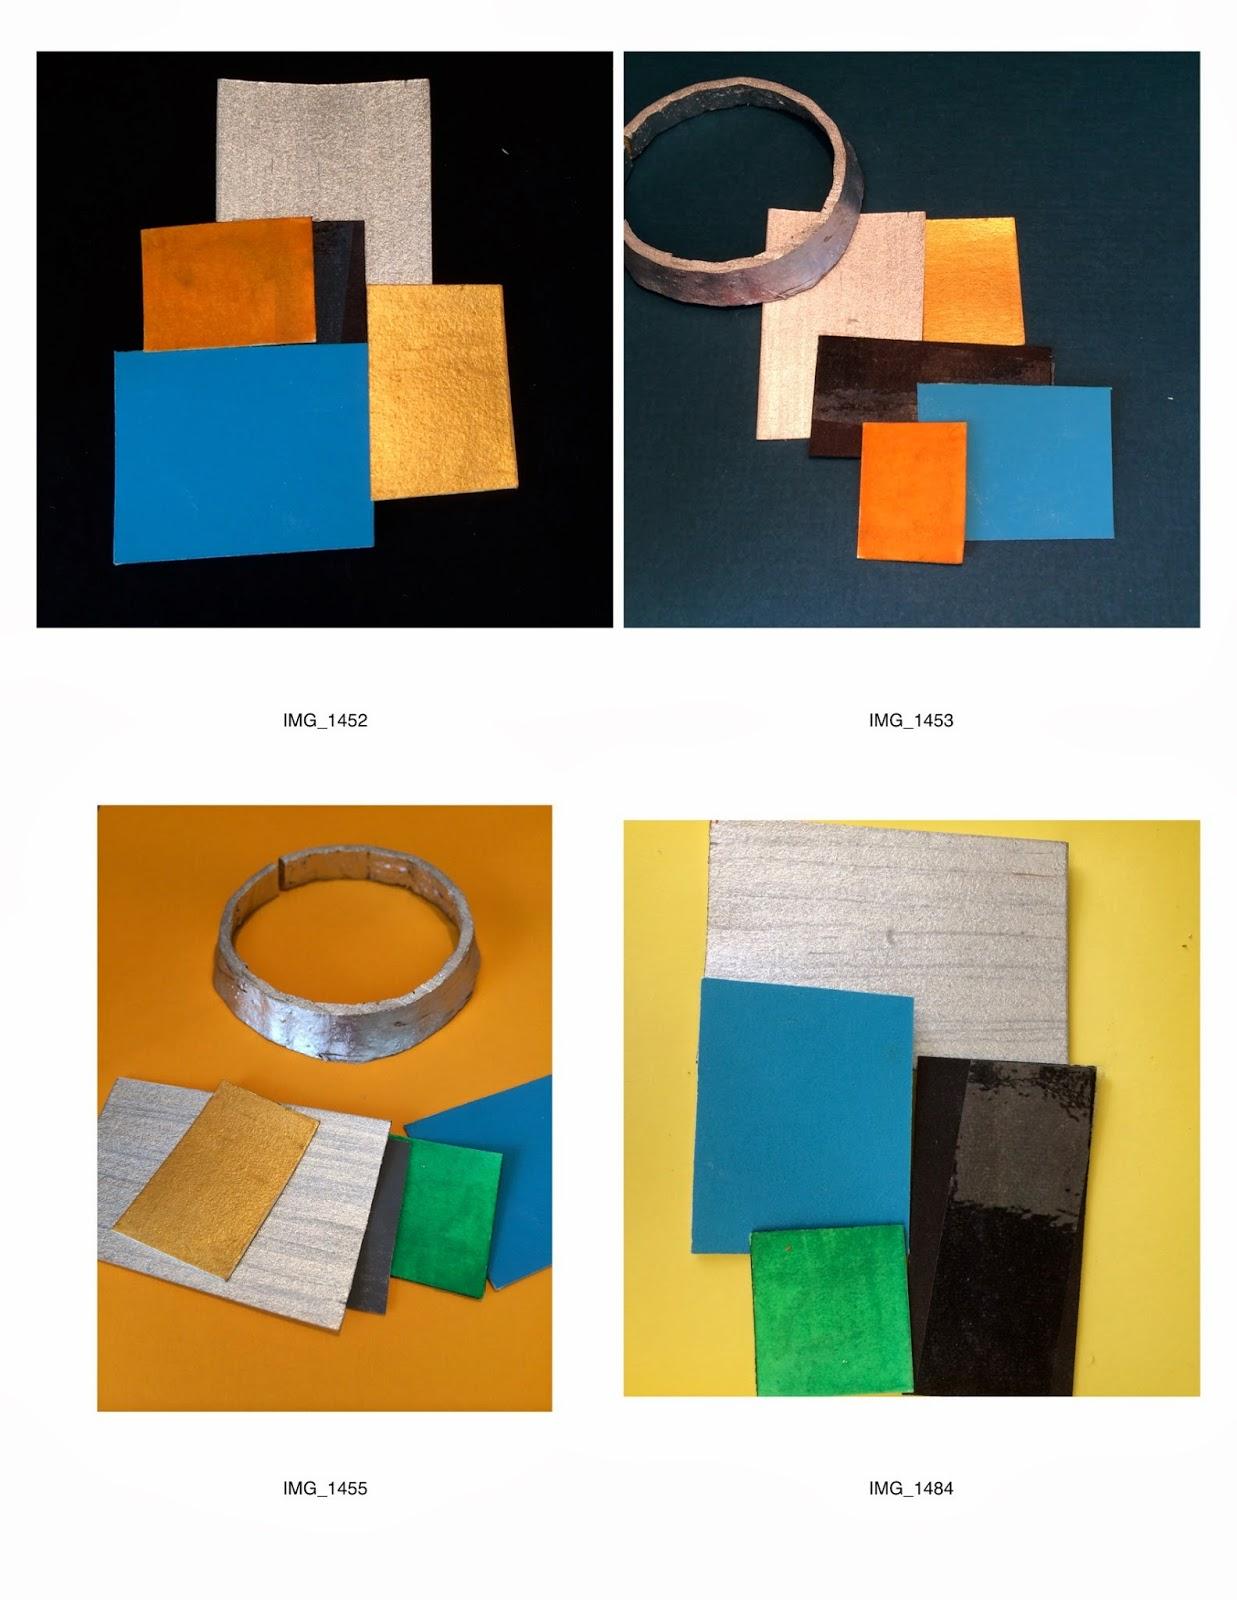 studio jeweler art deco miniature arrangement class. Black Bedroom Furniture Sets. Home Design Ideas